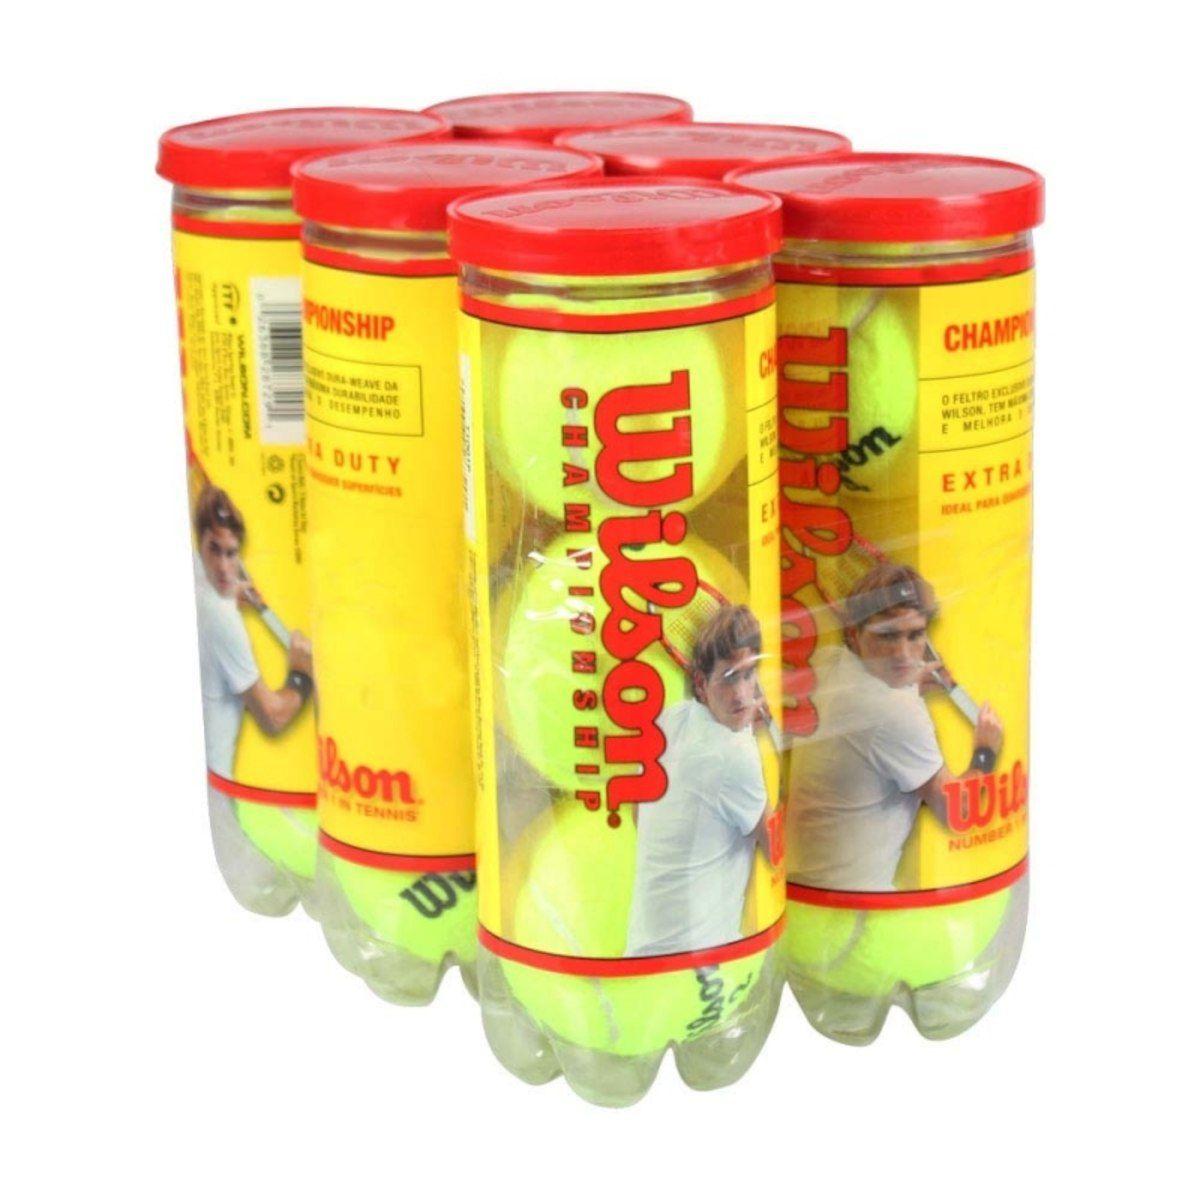 Bola de Tenis Wilson Championship - 6 tubos 18 Bolas.